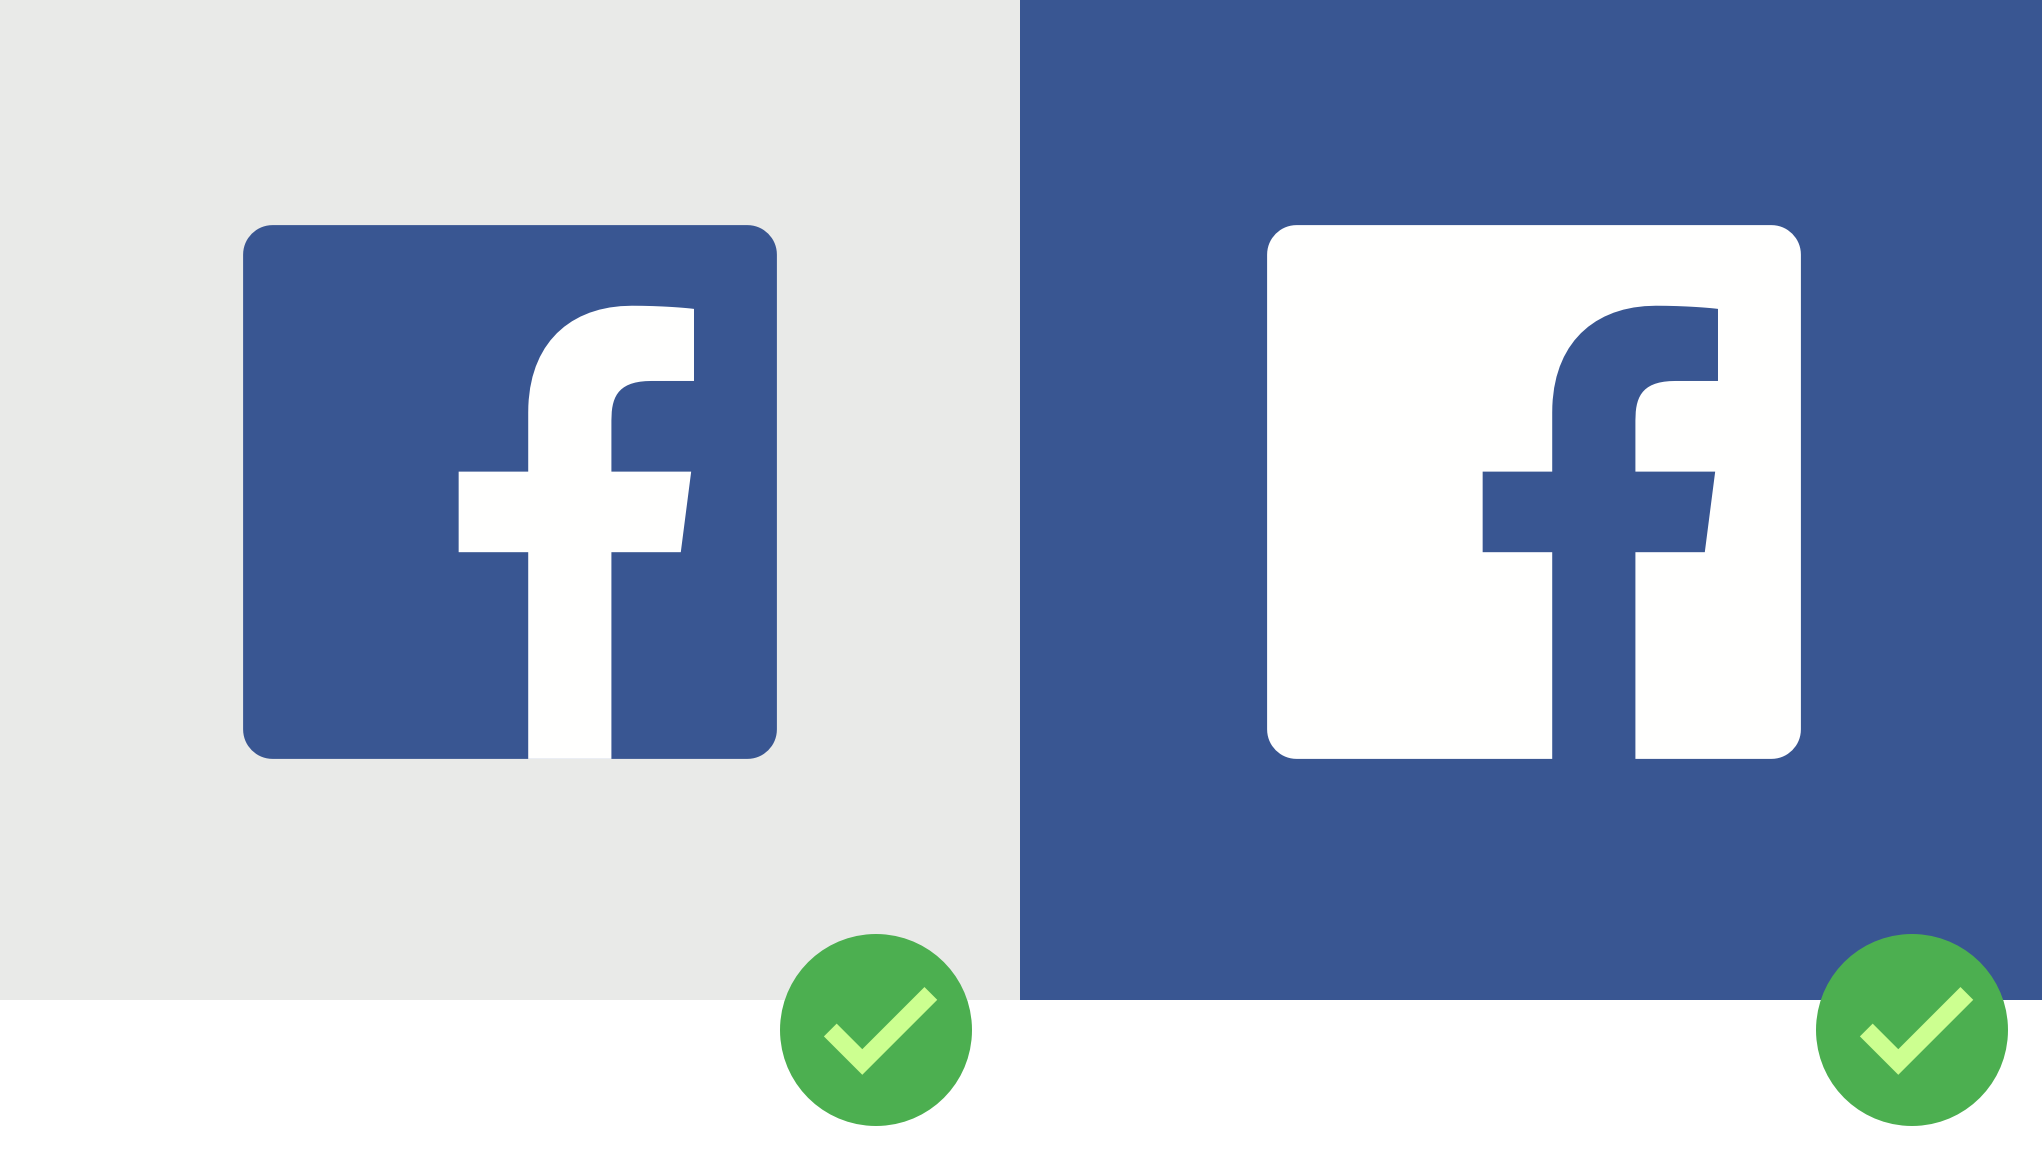 Proper Facebook Logo-Proper Facebook Logo-18